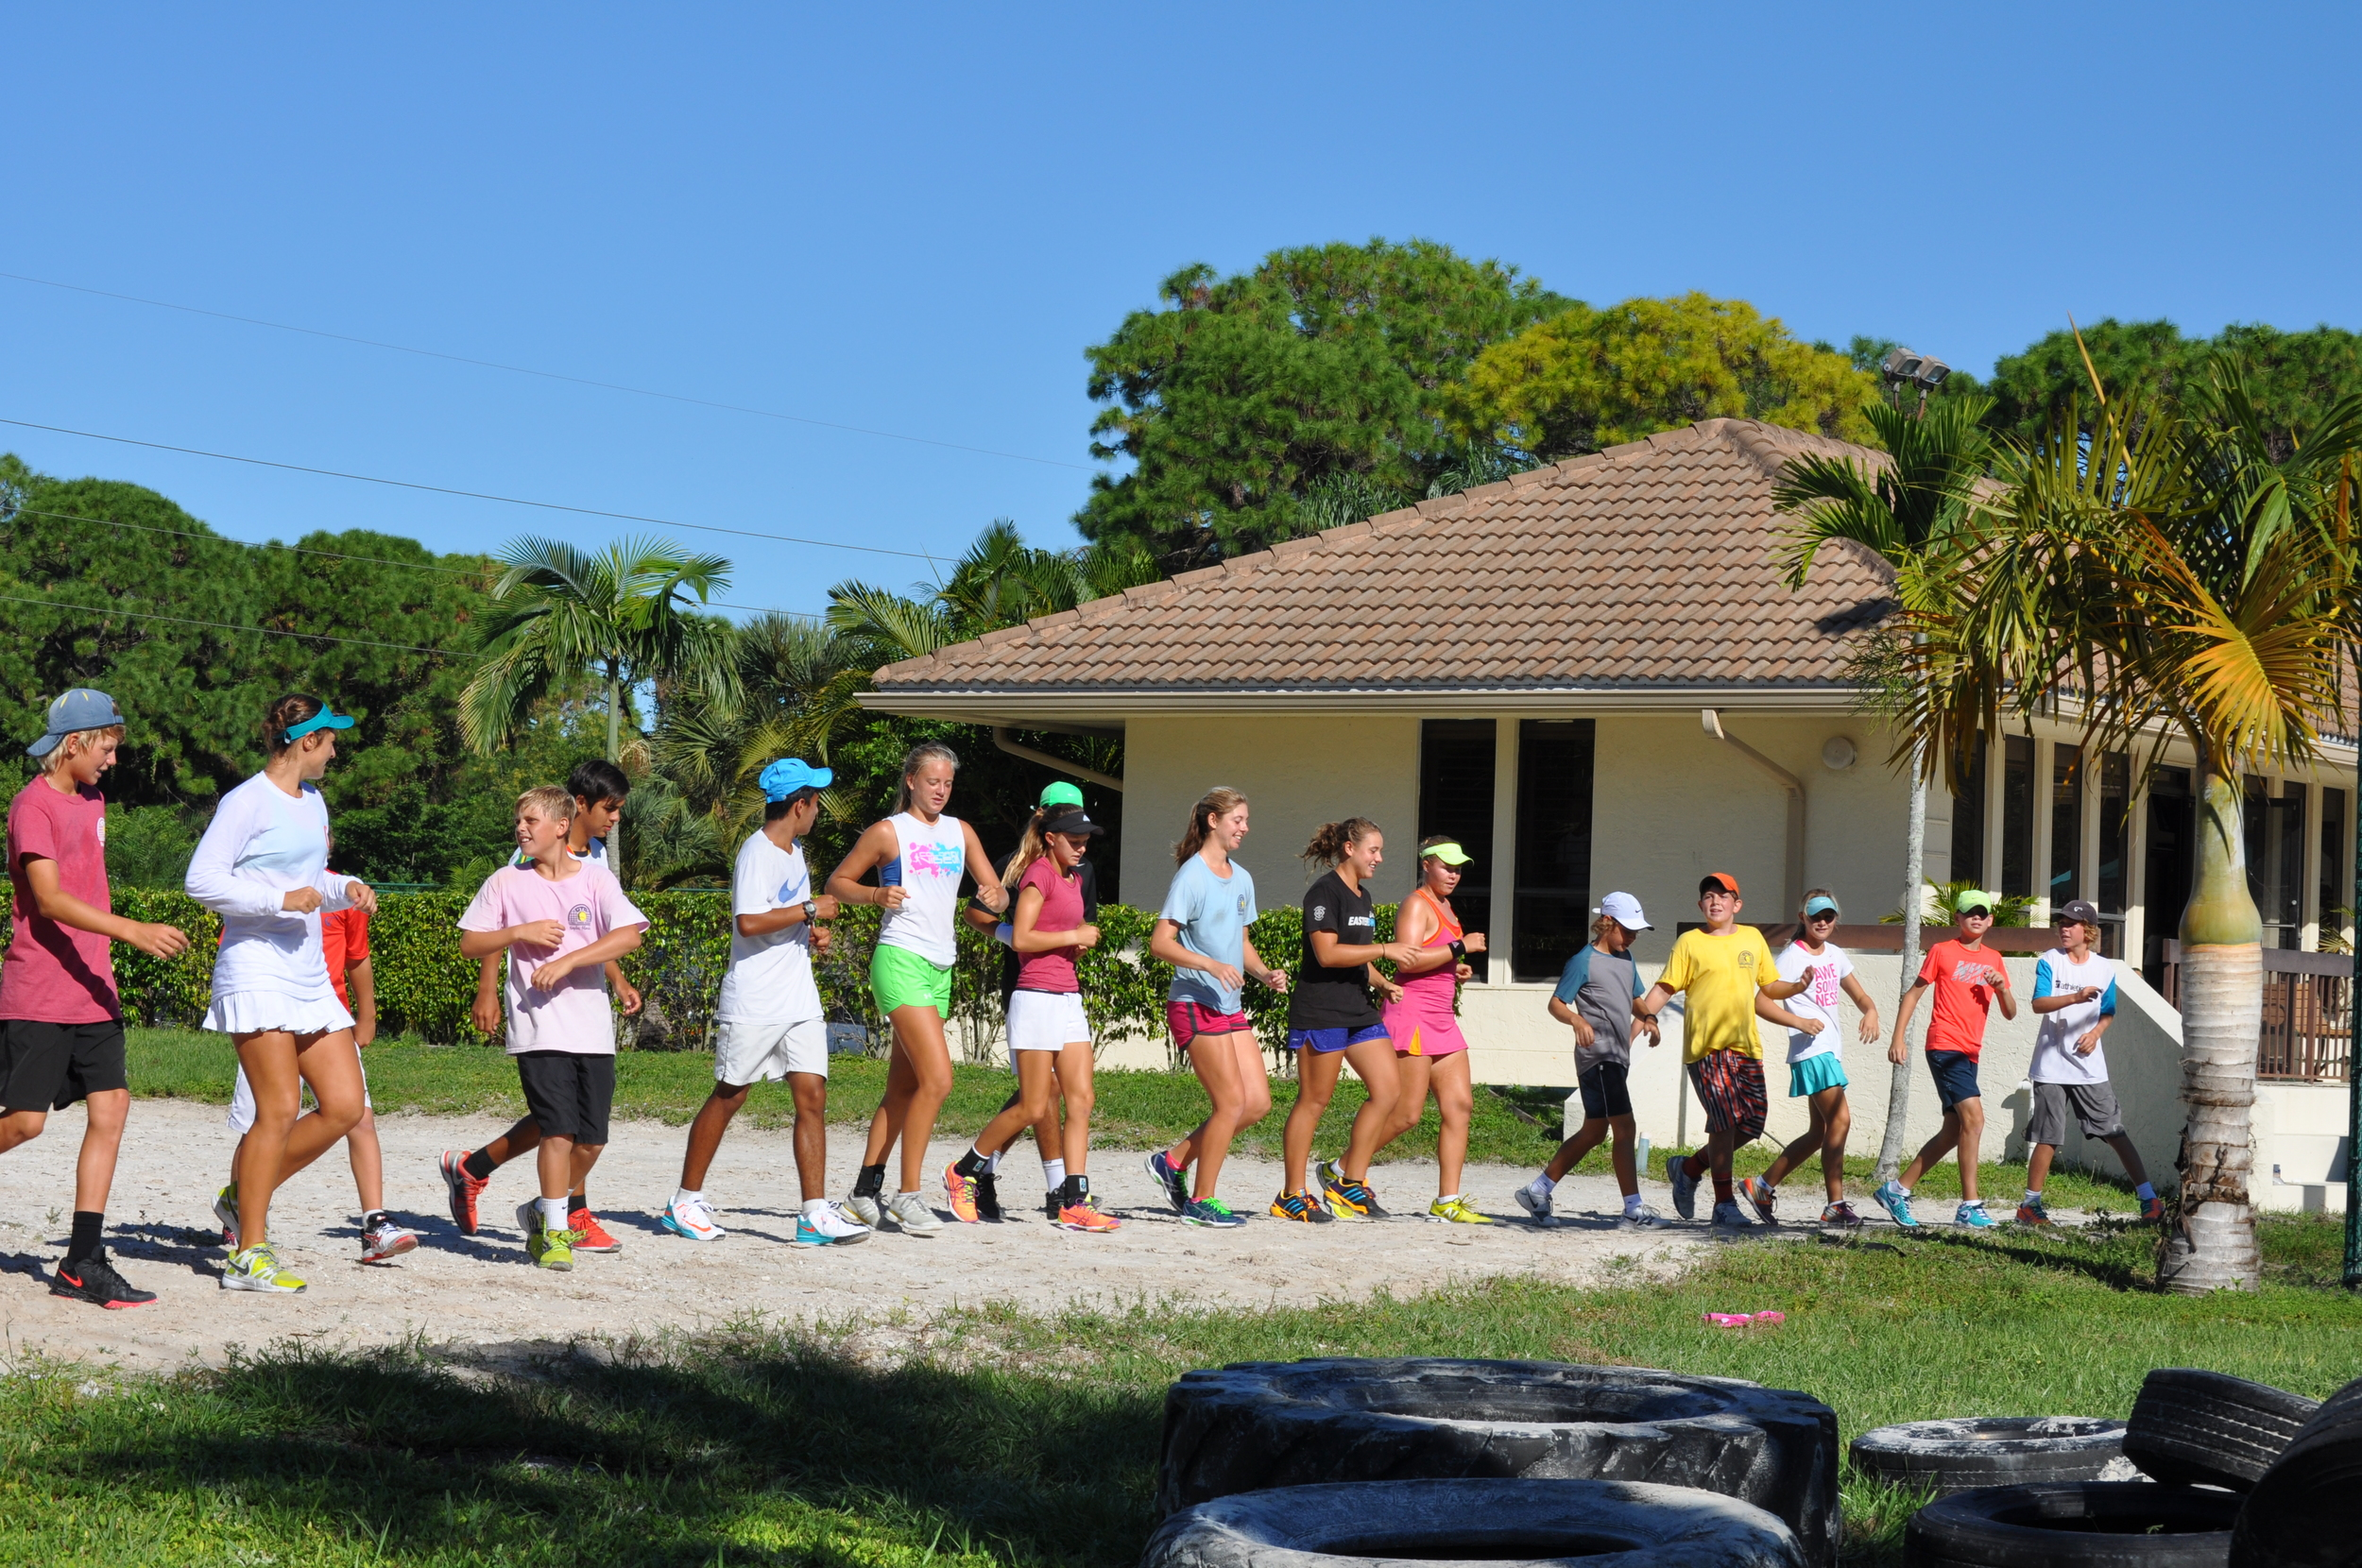 gomez-tennis-academy-outdoor-fitness-warmup.JPG